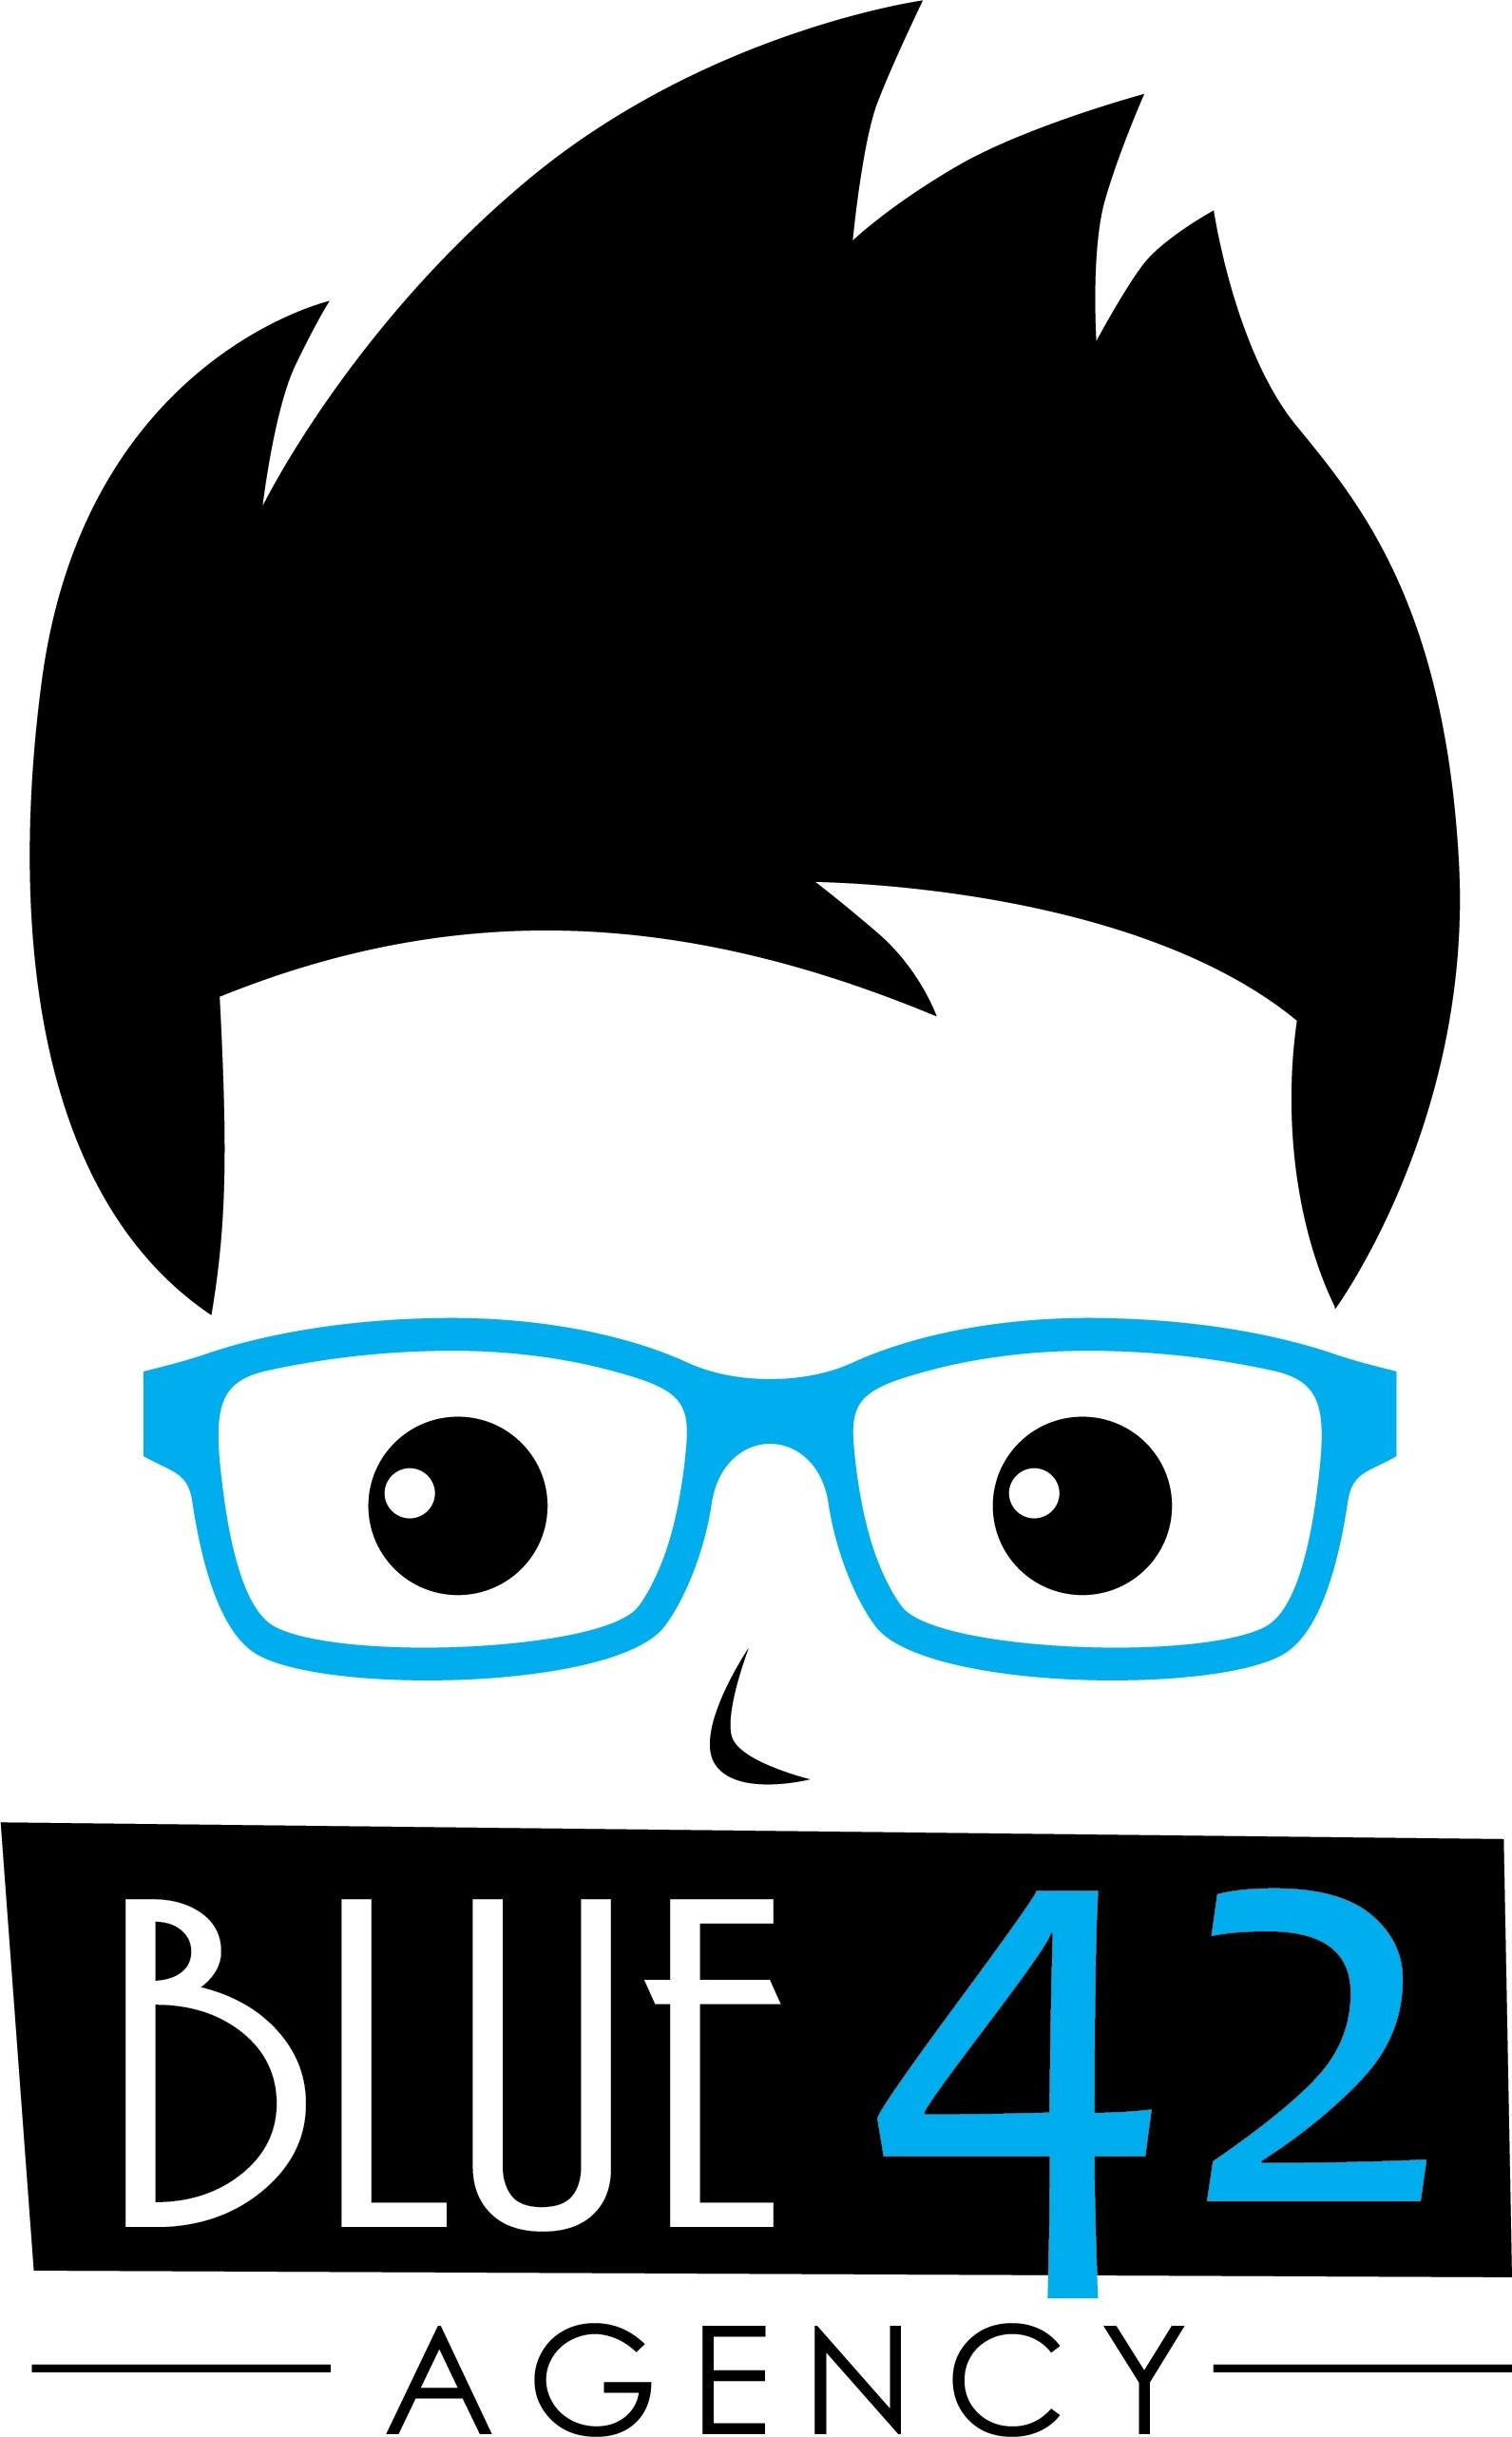 Blue42 Agency Logo I Stacked.jpg